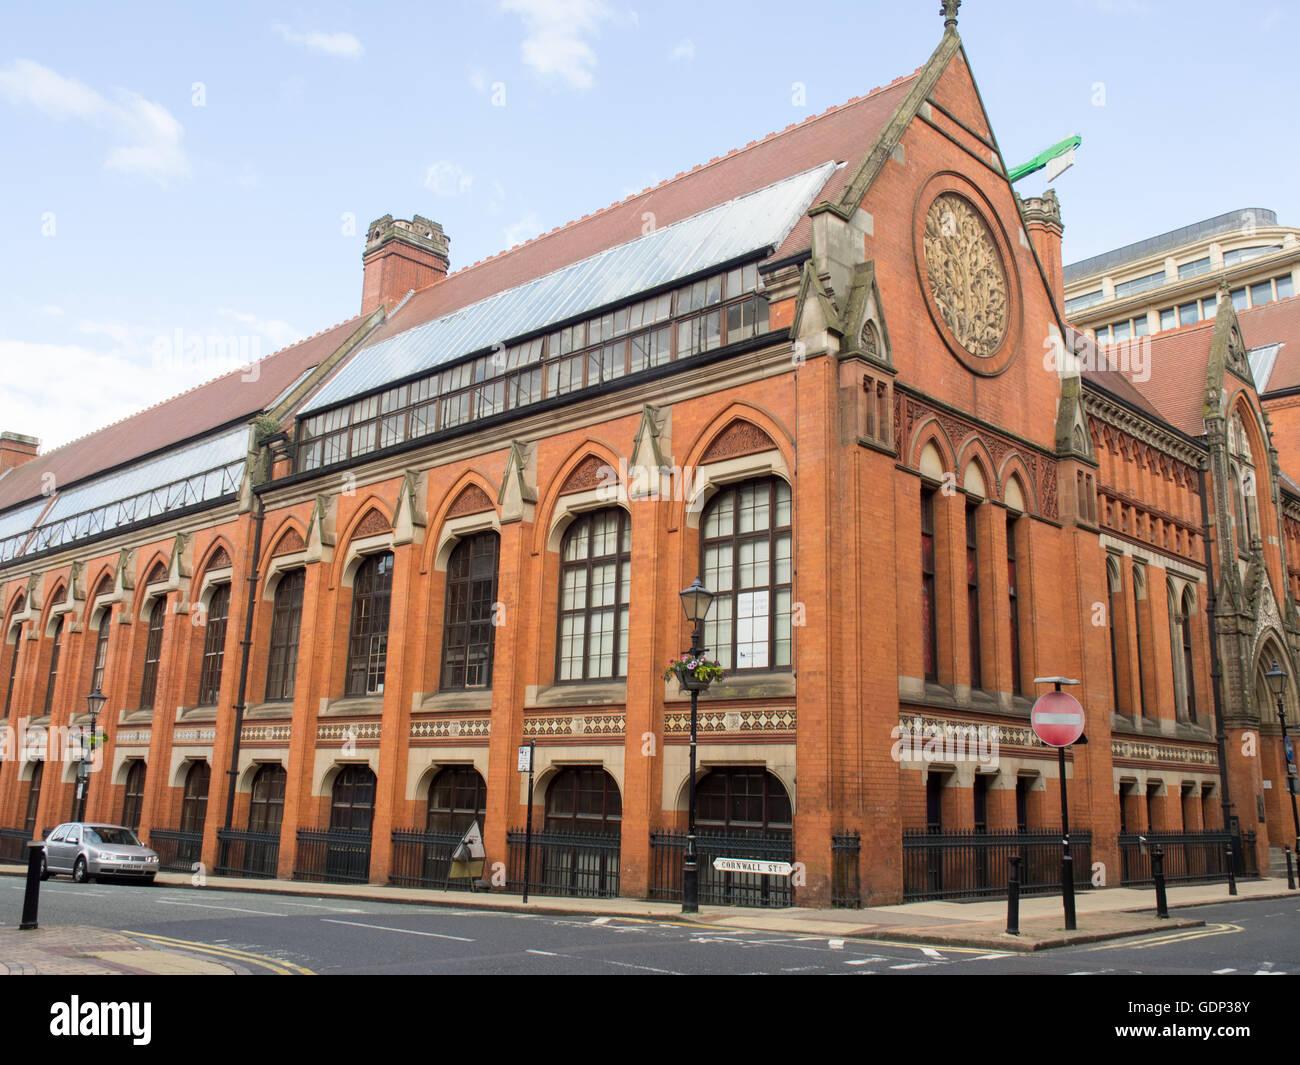 Birmingham City University School of Fine Art, formerly home of the Birmingham School of Art. Stock Photo